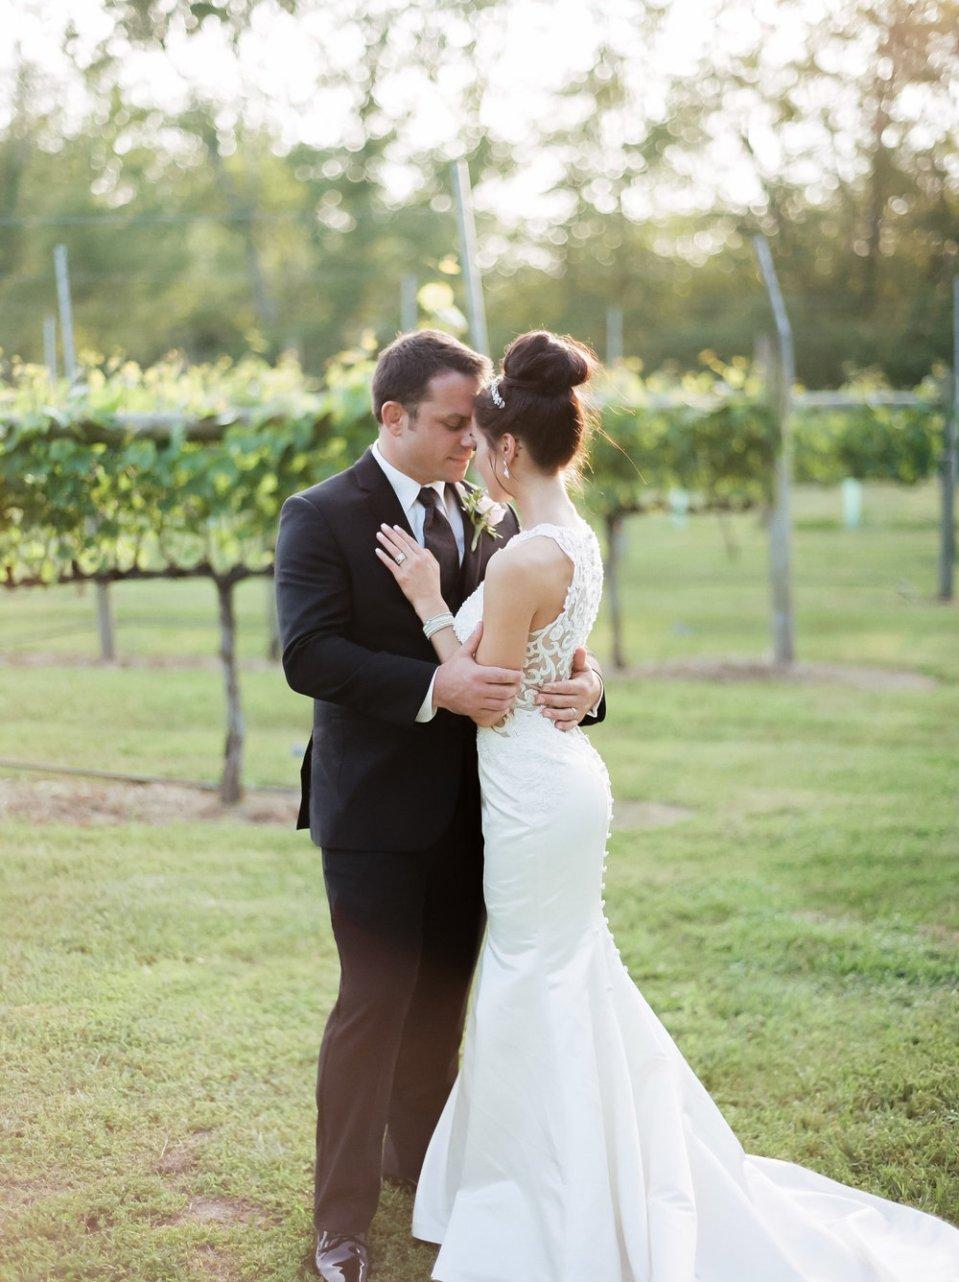 MagdalenaStudios WeddingPhotographer WillowCreekWinery CarissaJoe 462